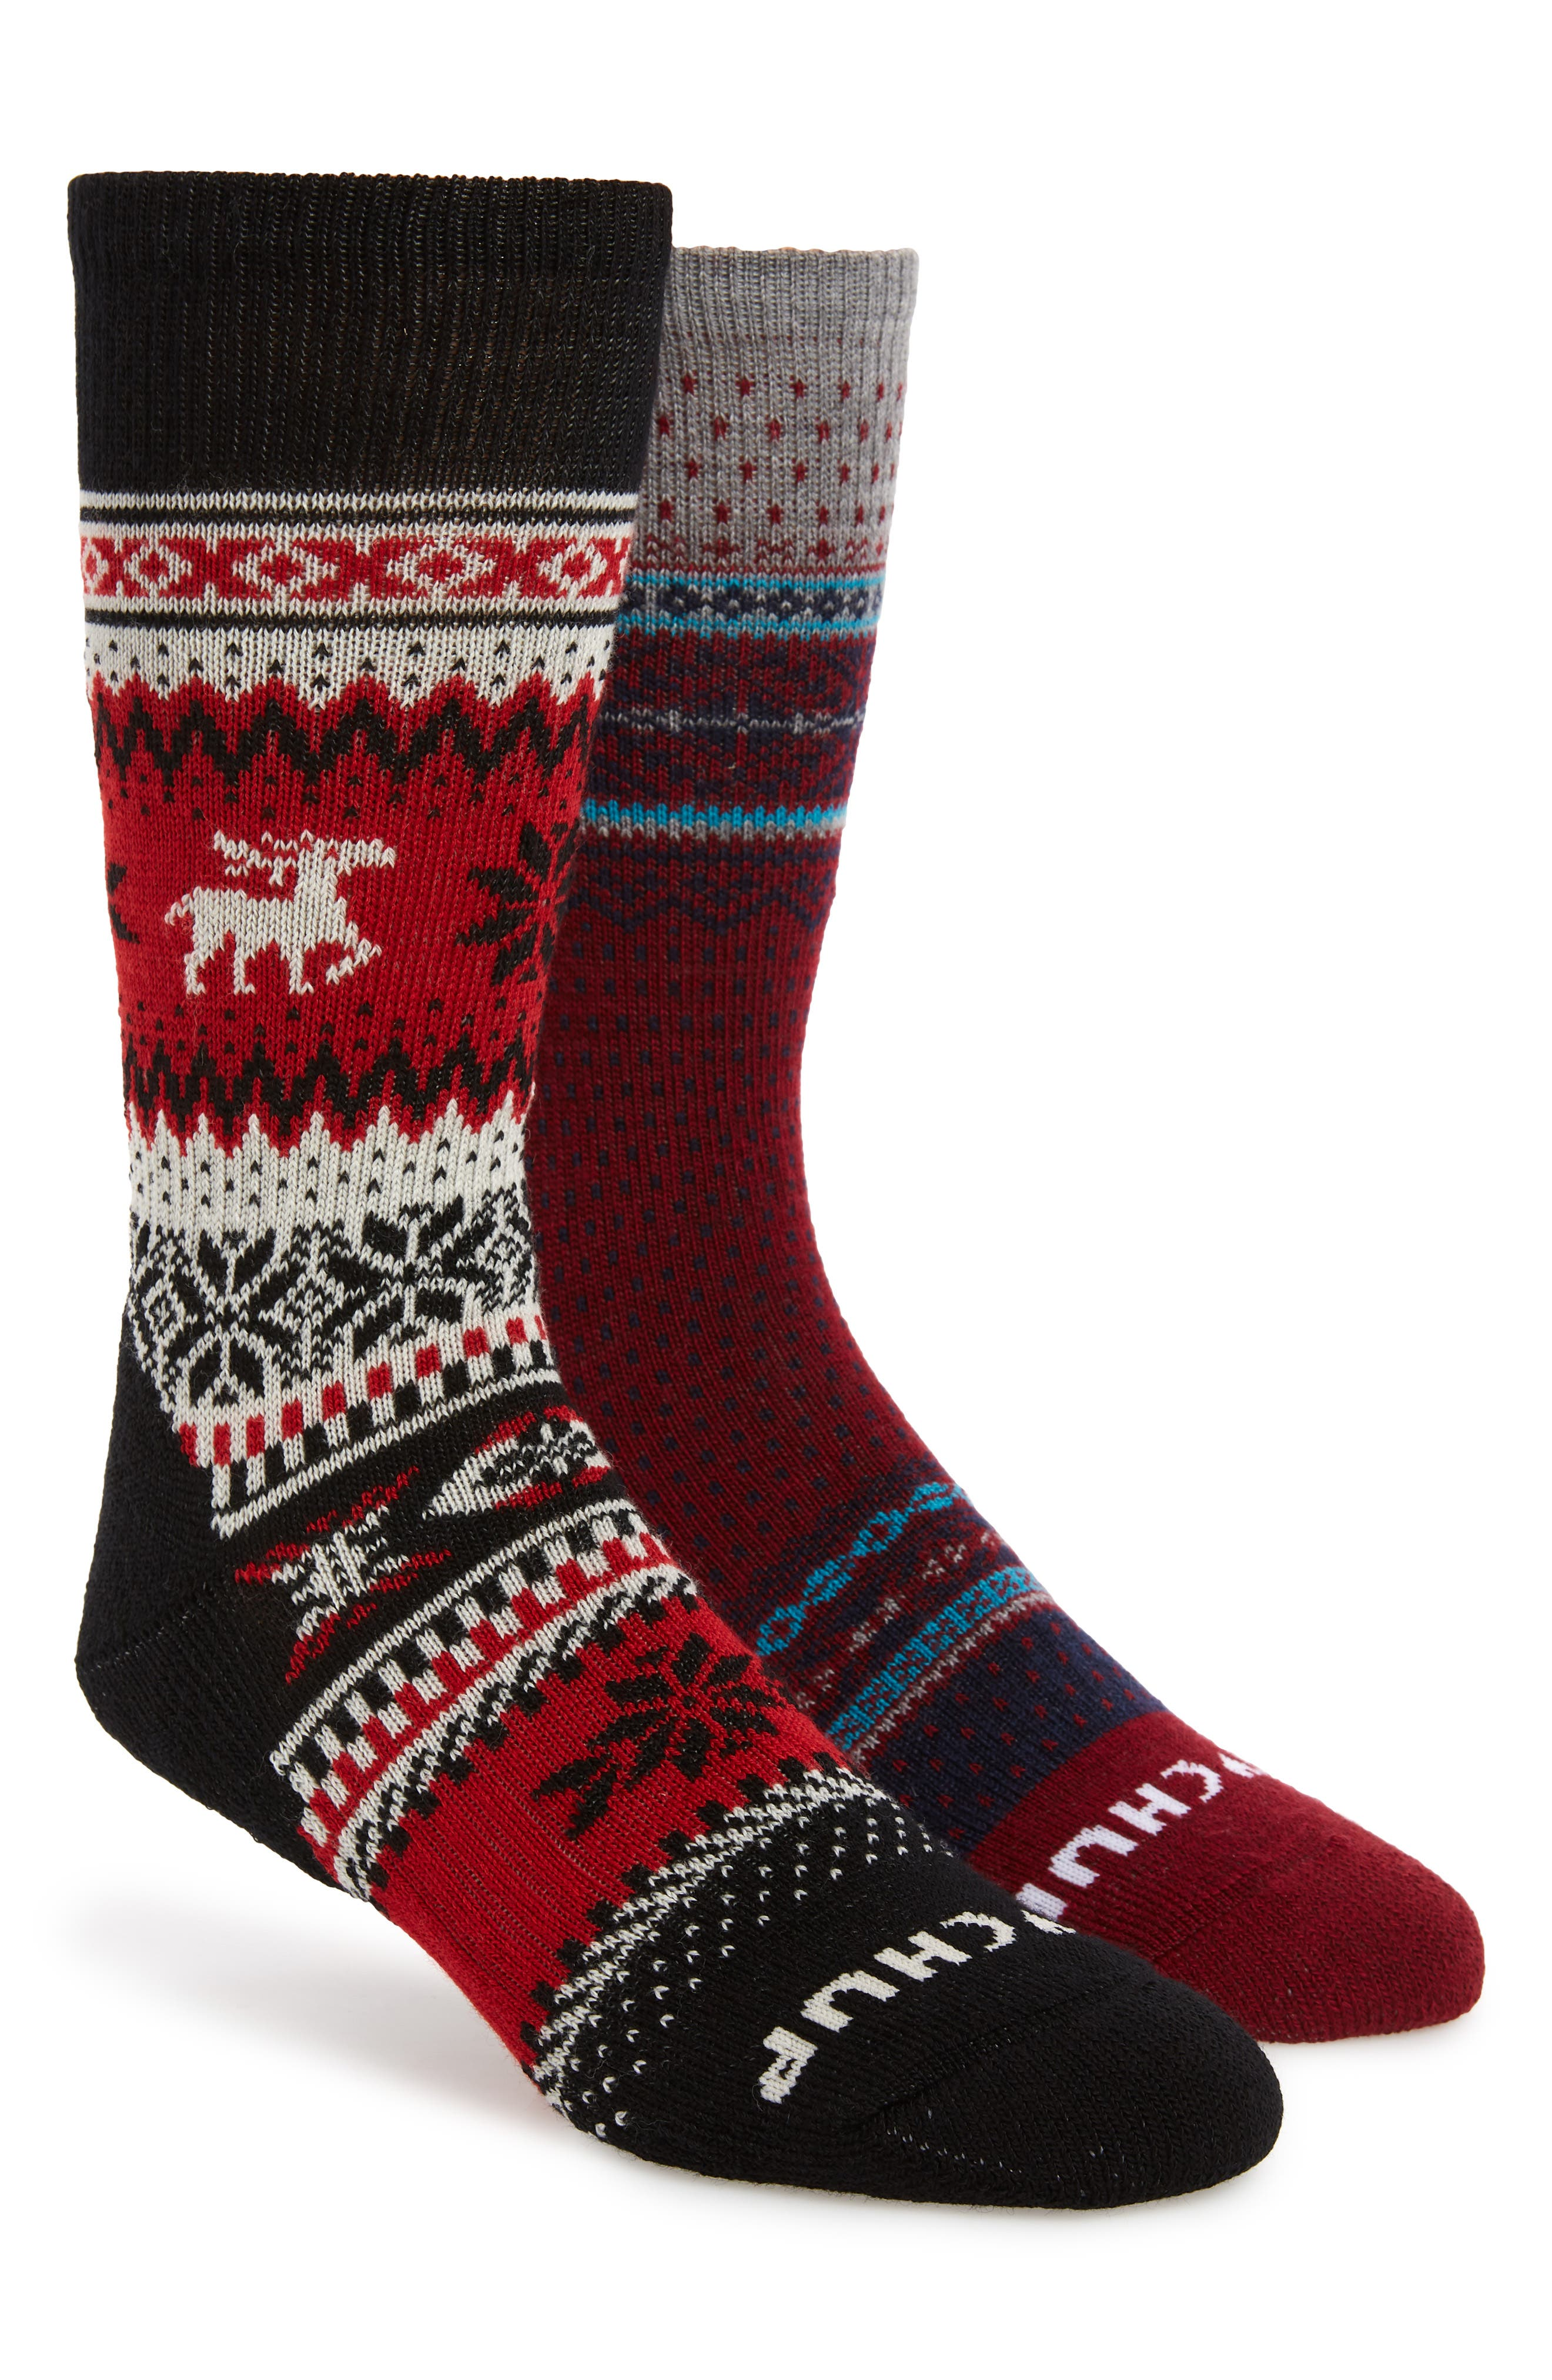 x CHUP 2-Pack Socks, Main, color, BLACK/ TIBETAN RED